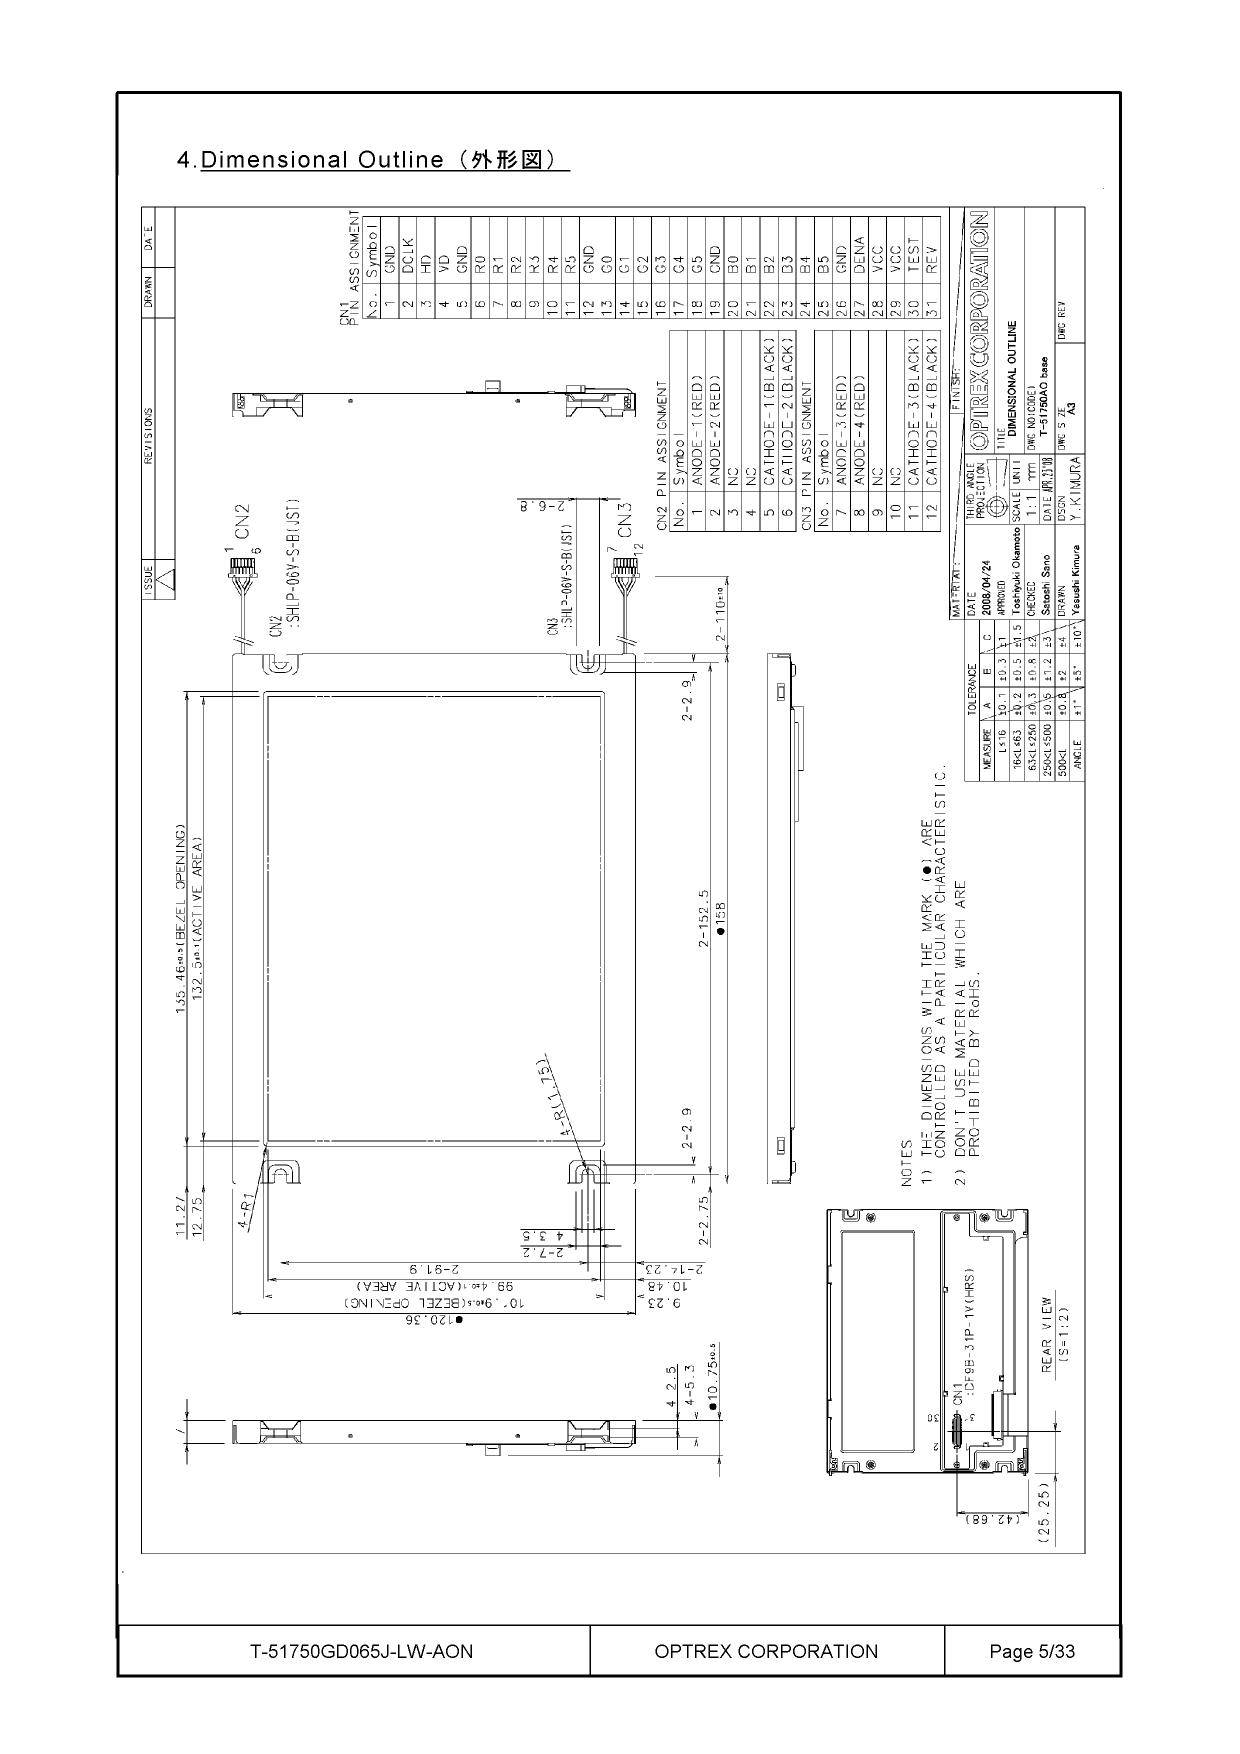 T-51750GD065J-LW-AON pdf